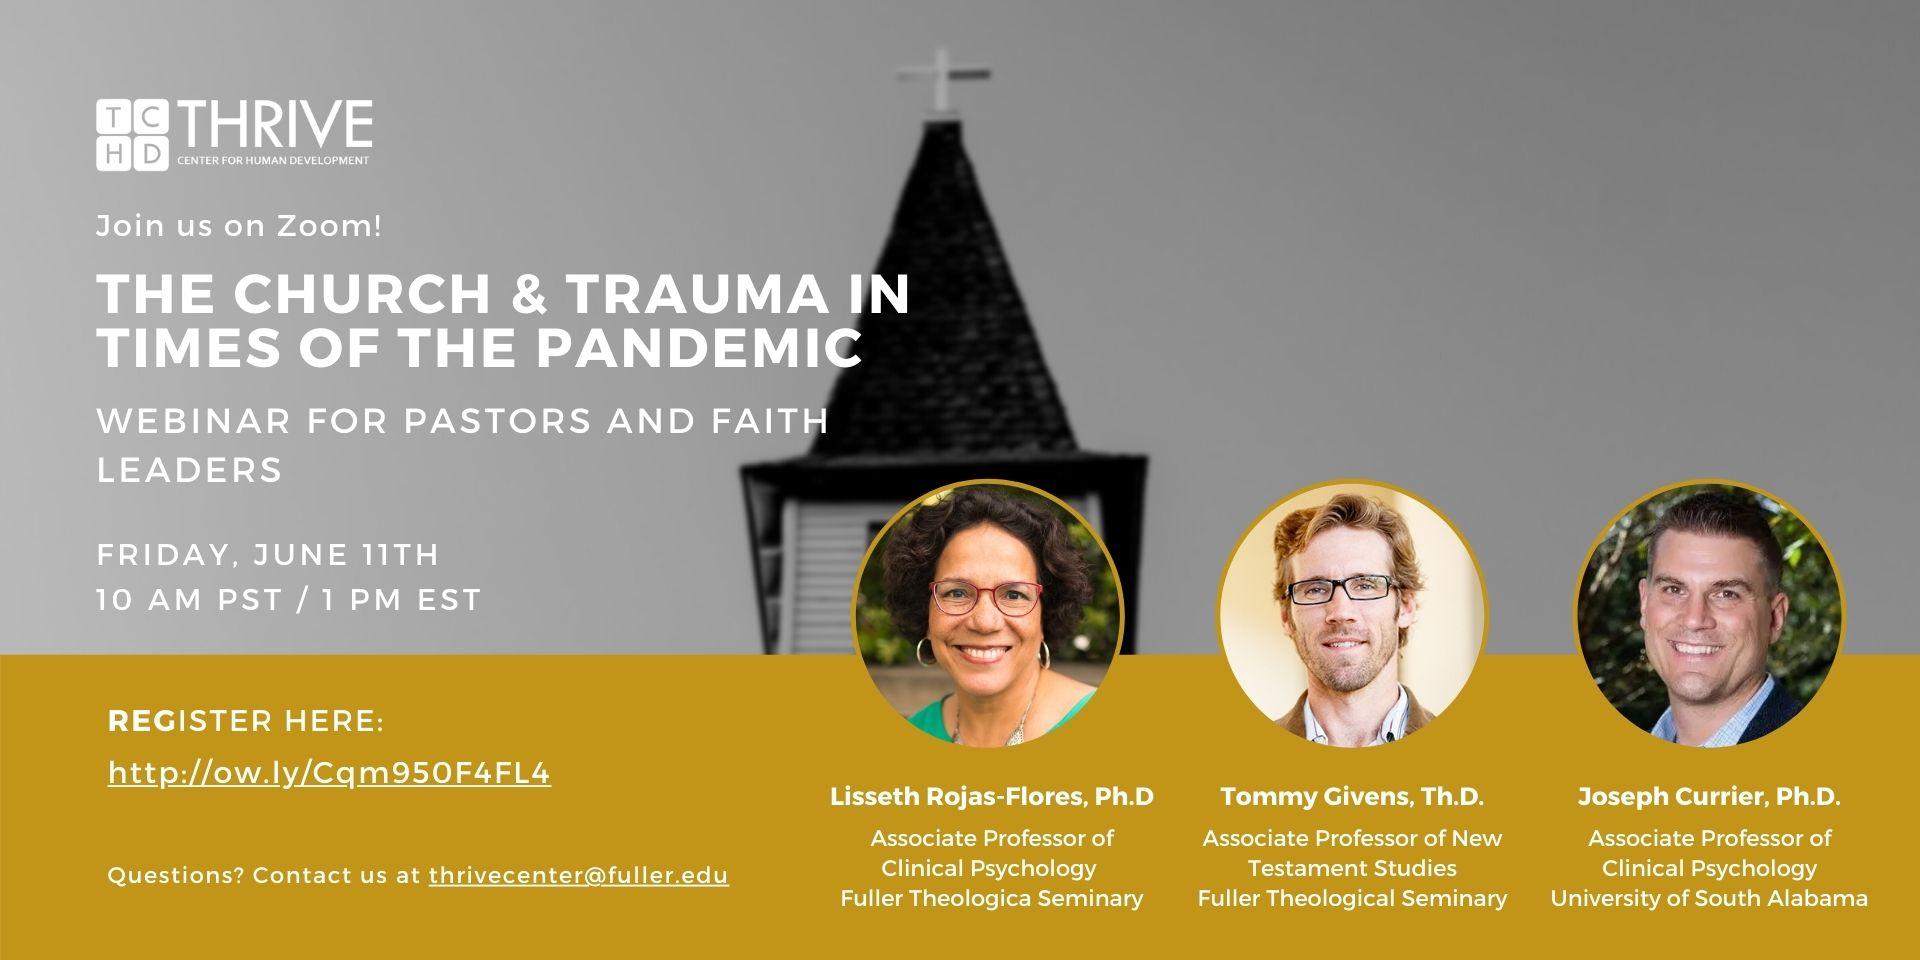 Webinar banner for pastors and faith leaders